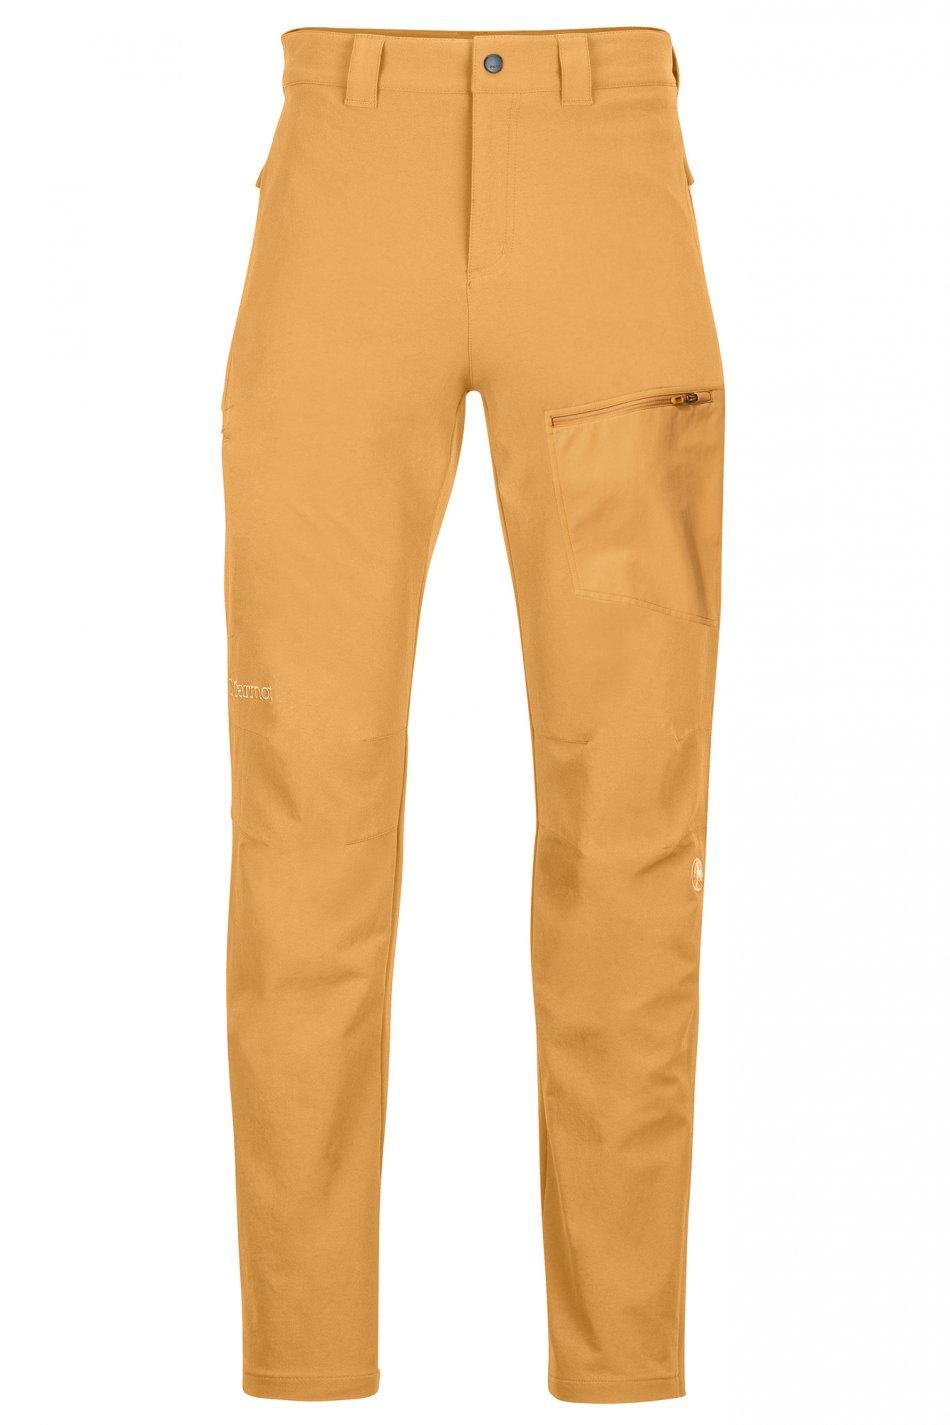 Pantaloni Scree PanT - Scotch